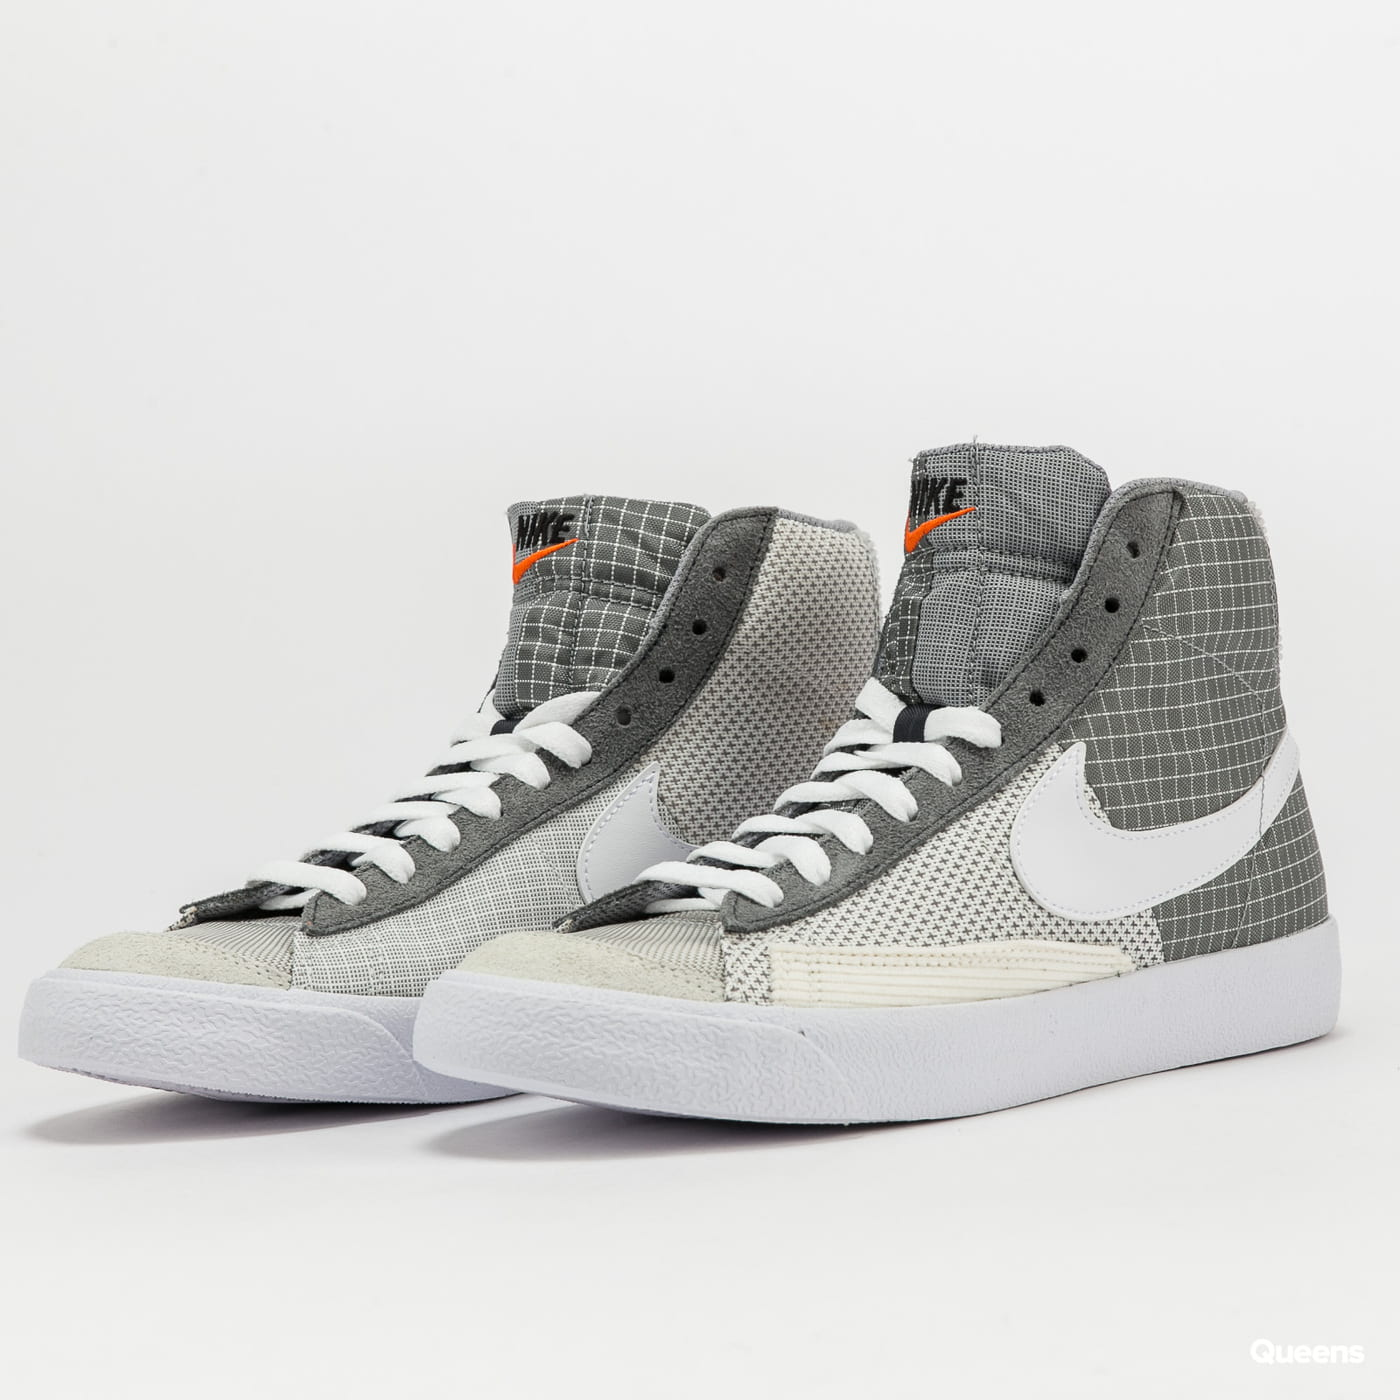 Nike Blazer Mid '77 smoke grey / white - particle grey